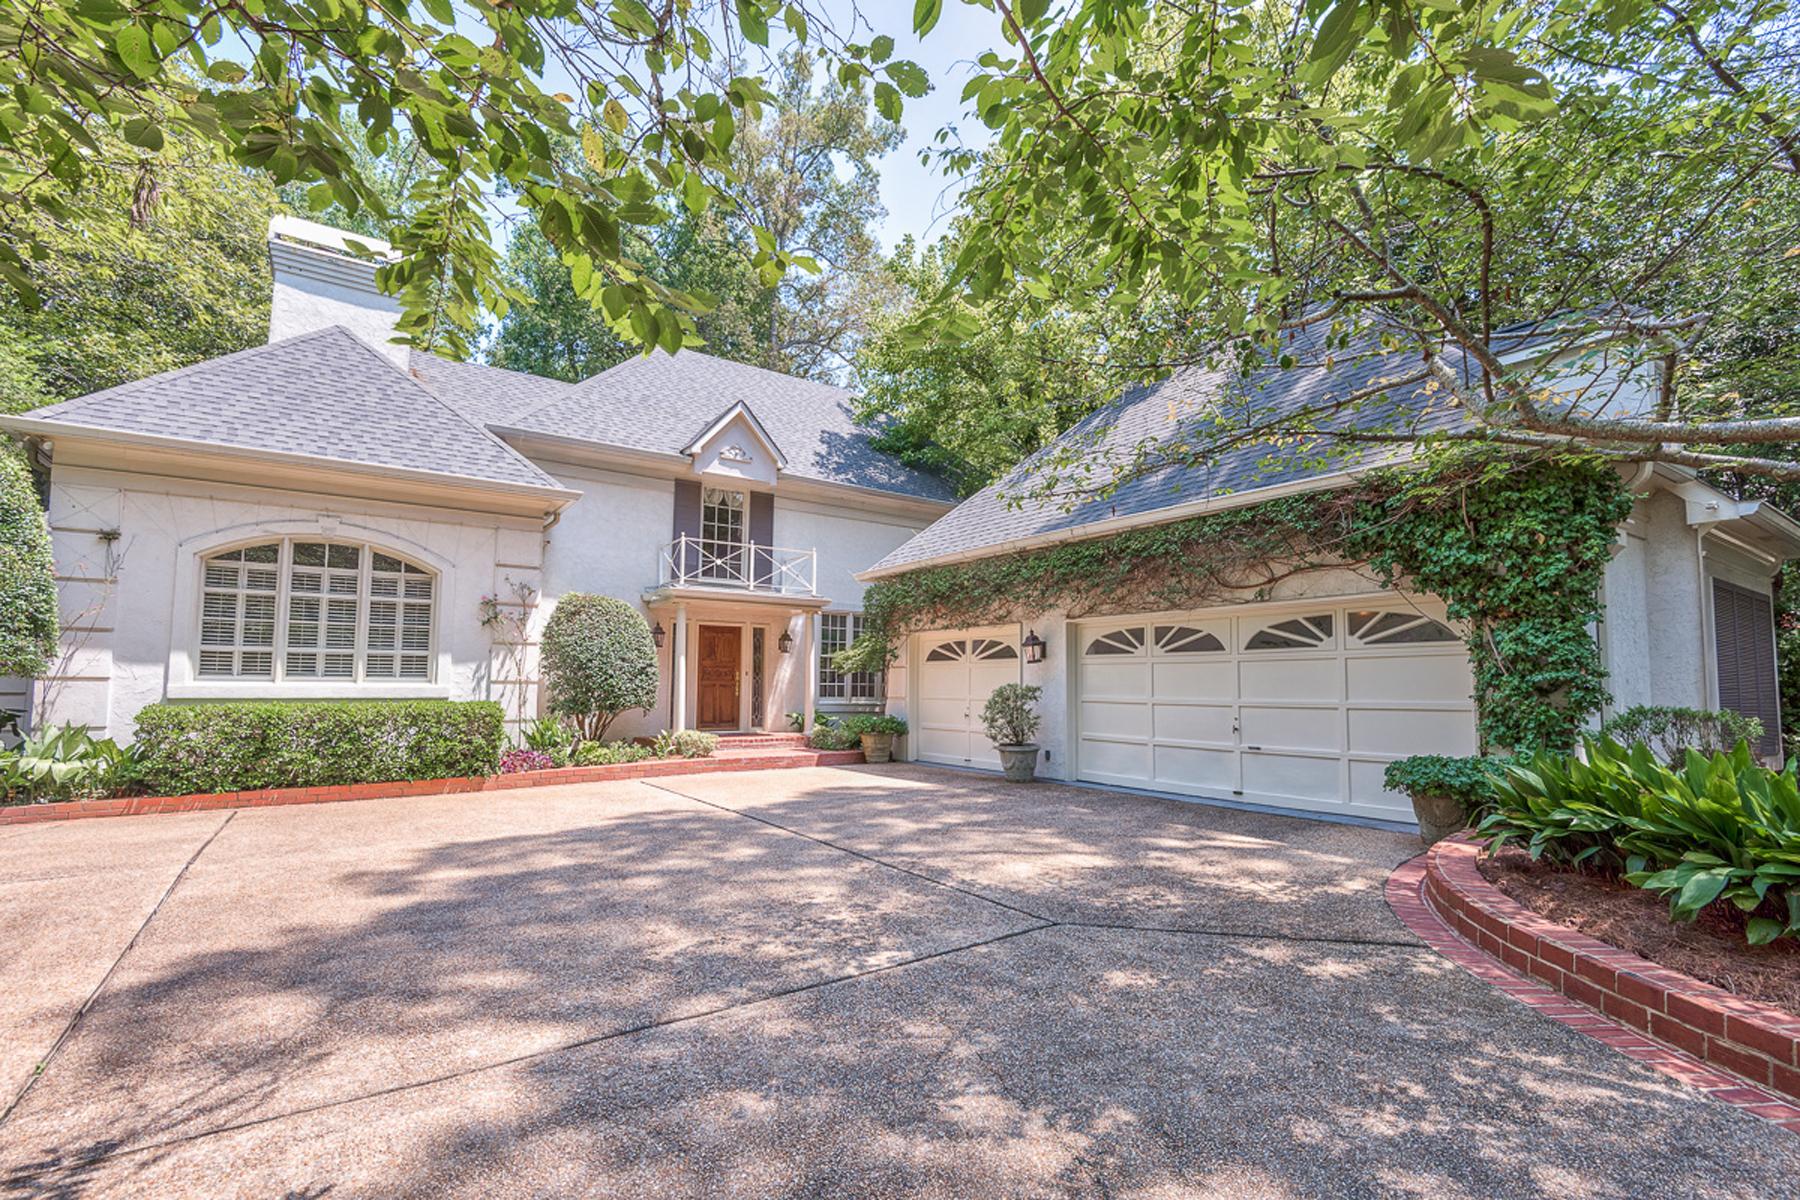 Nhà ở một gia đình vì Bán tại European Style Home In Buckhead 105 Blackland Road NW Tuxedo Park, Atlanta, Georgia 30342 Hoa Kỳ